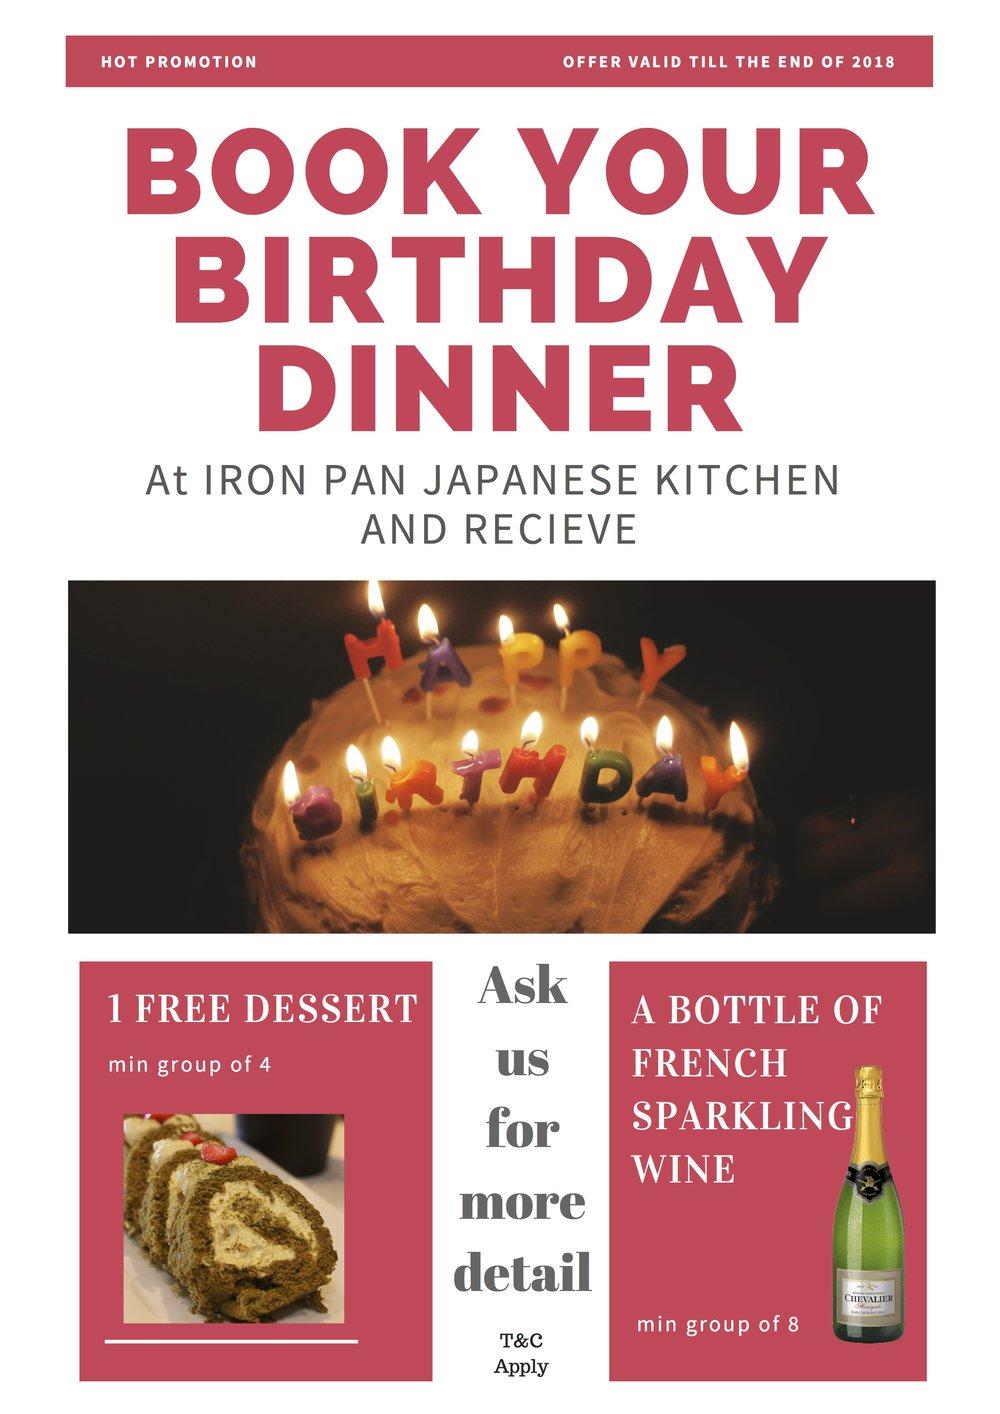 BOOK YOURBIRThday DINNER.jpg